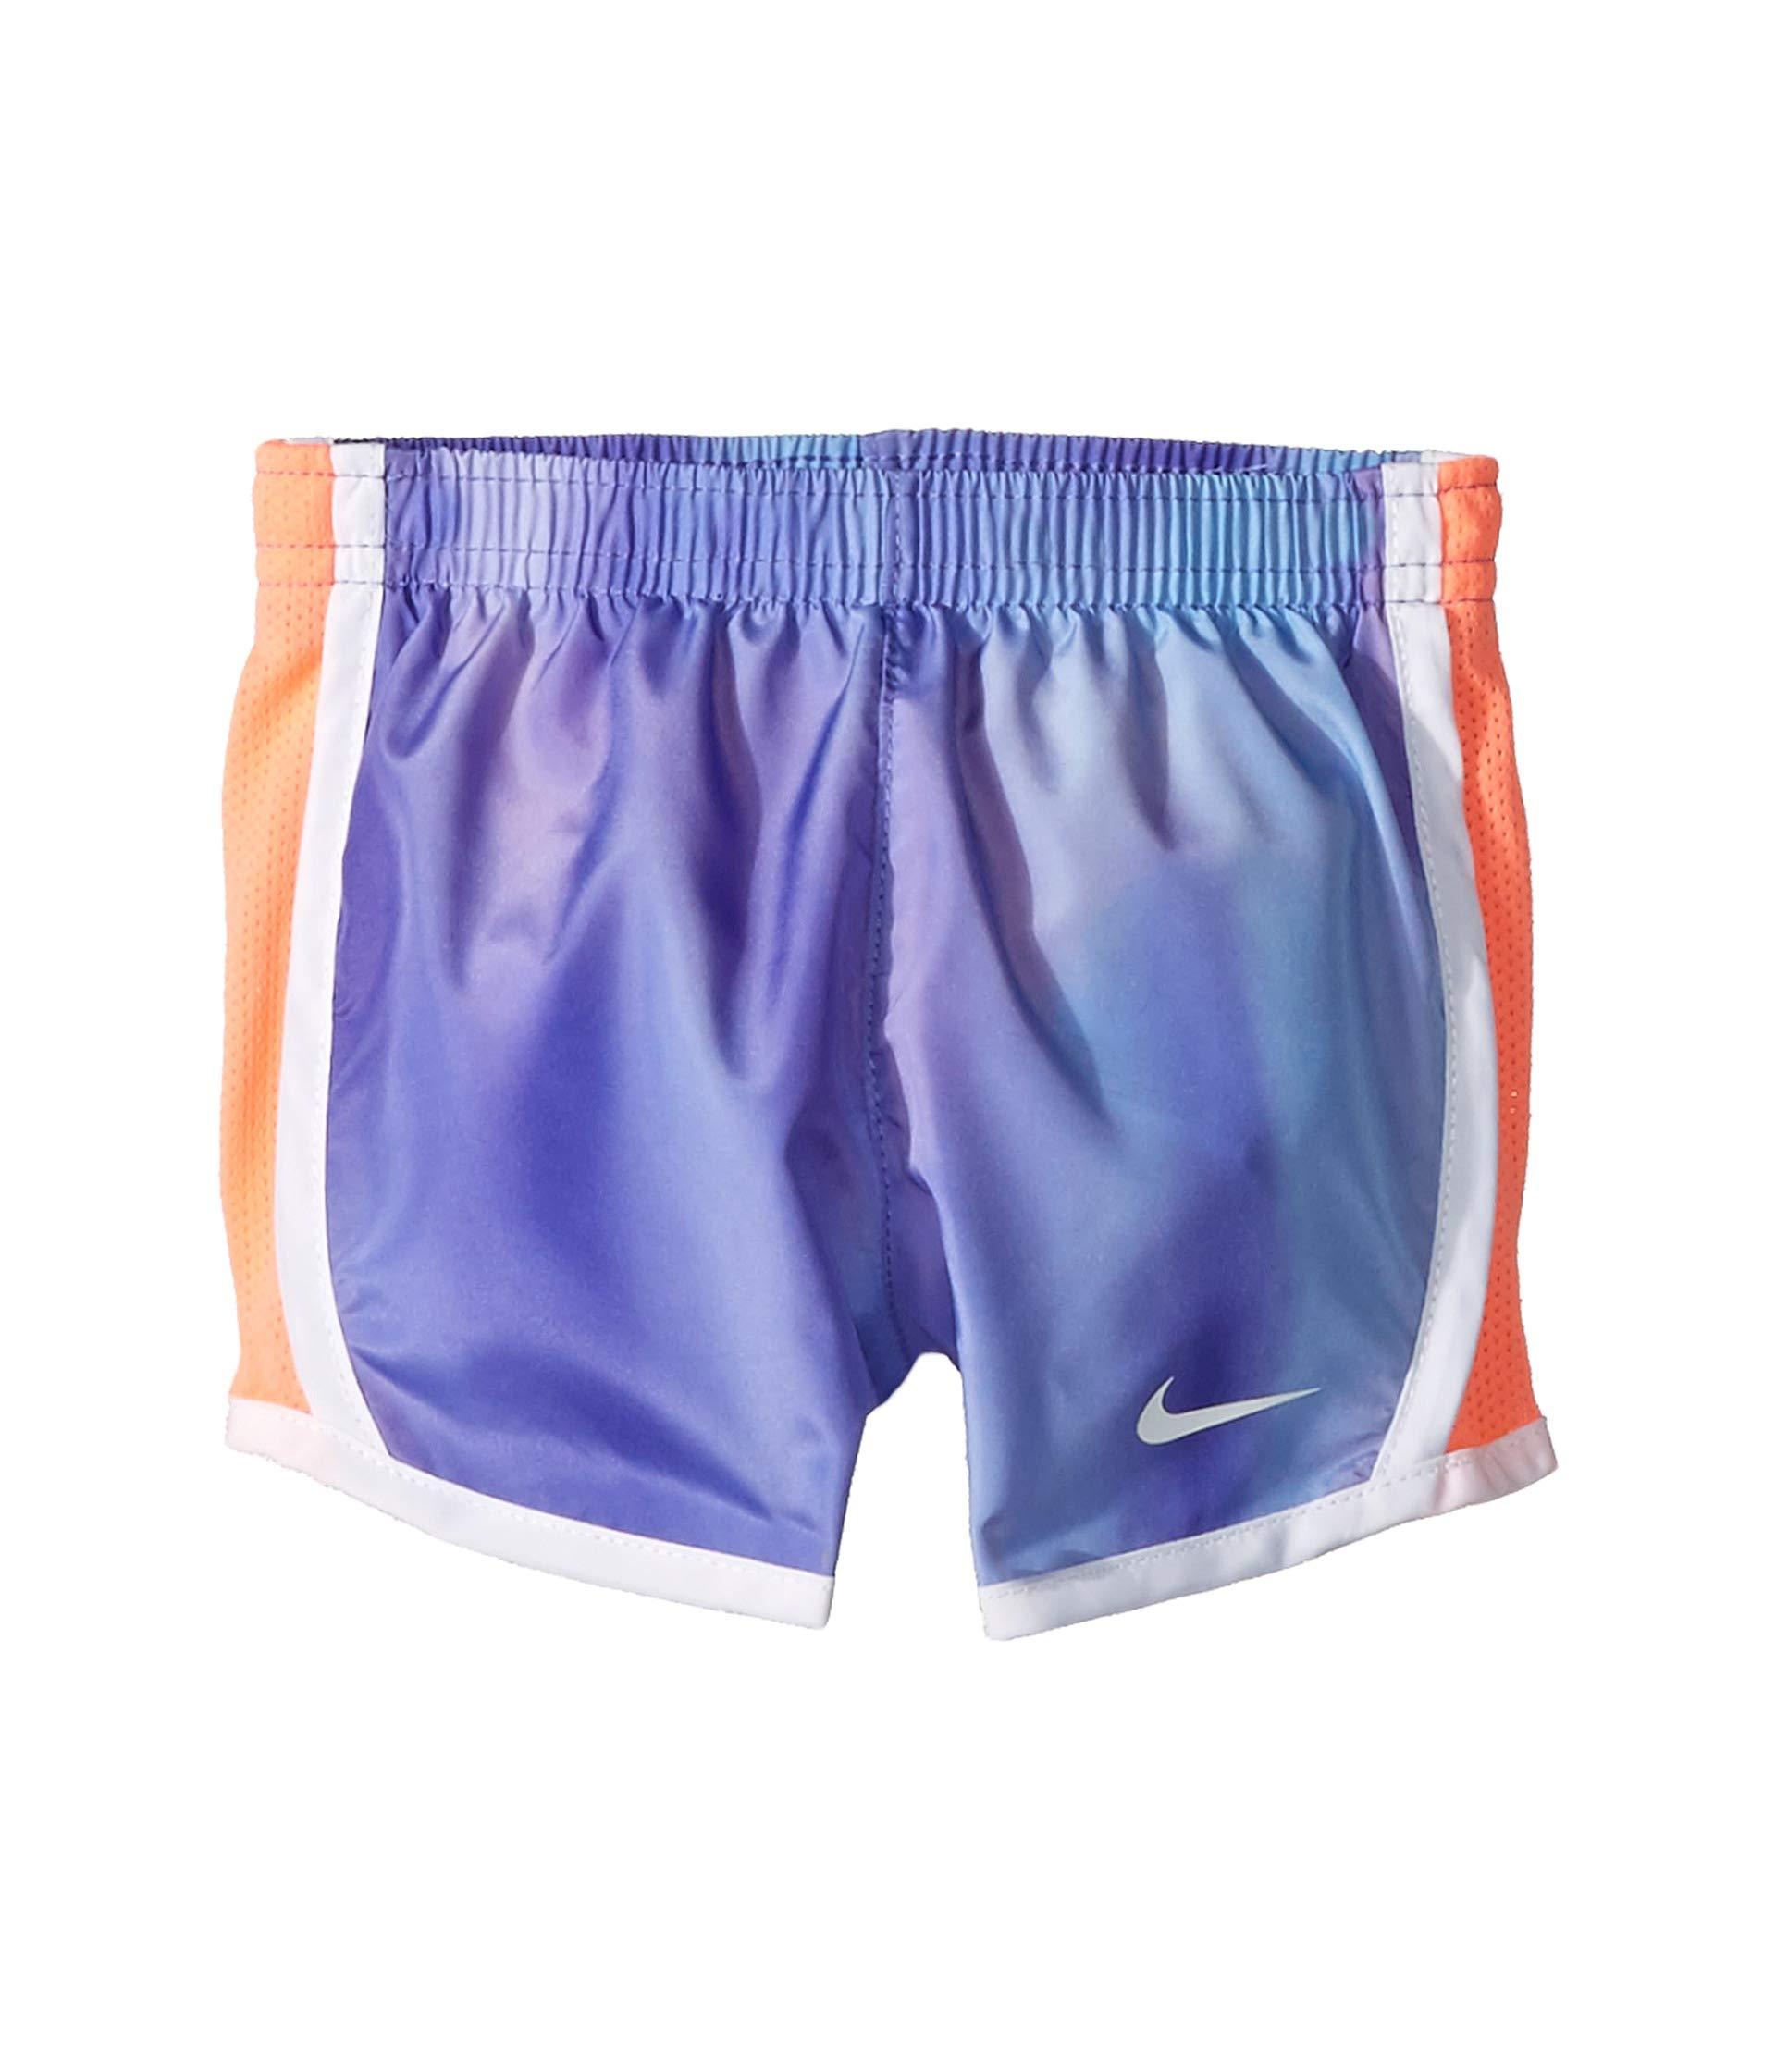 Nike Toddler Girls Dri-Fit Tempo Shorts - Cool Gray 2T